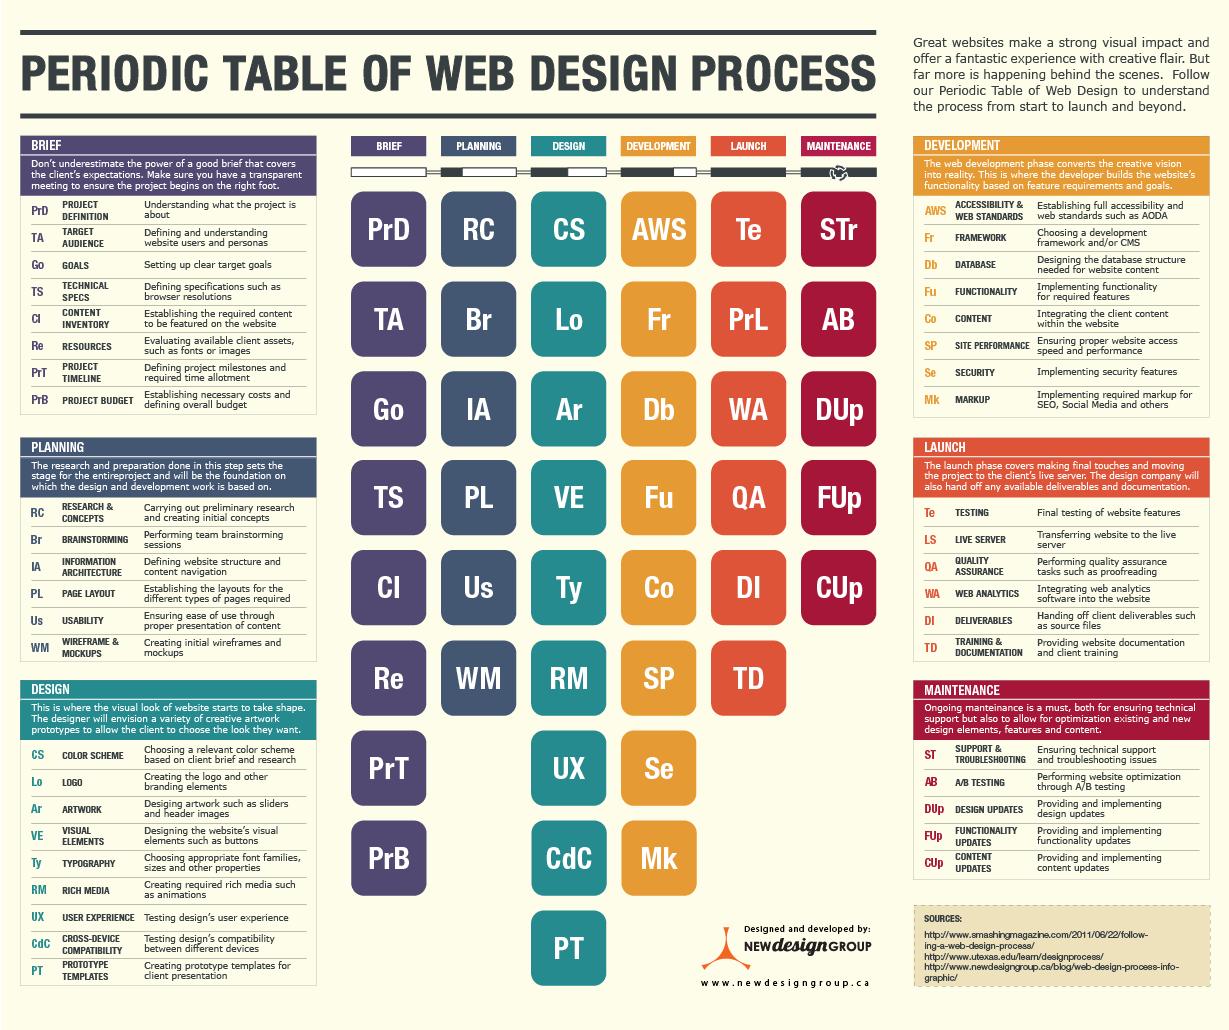 Web design company web development seo services e commerce the web design process periodic table infographic speckyboy design magazine gamestrikefo Images